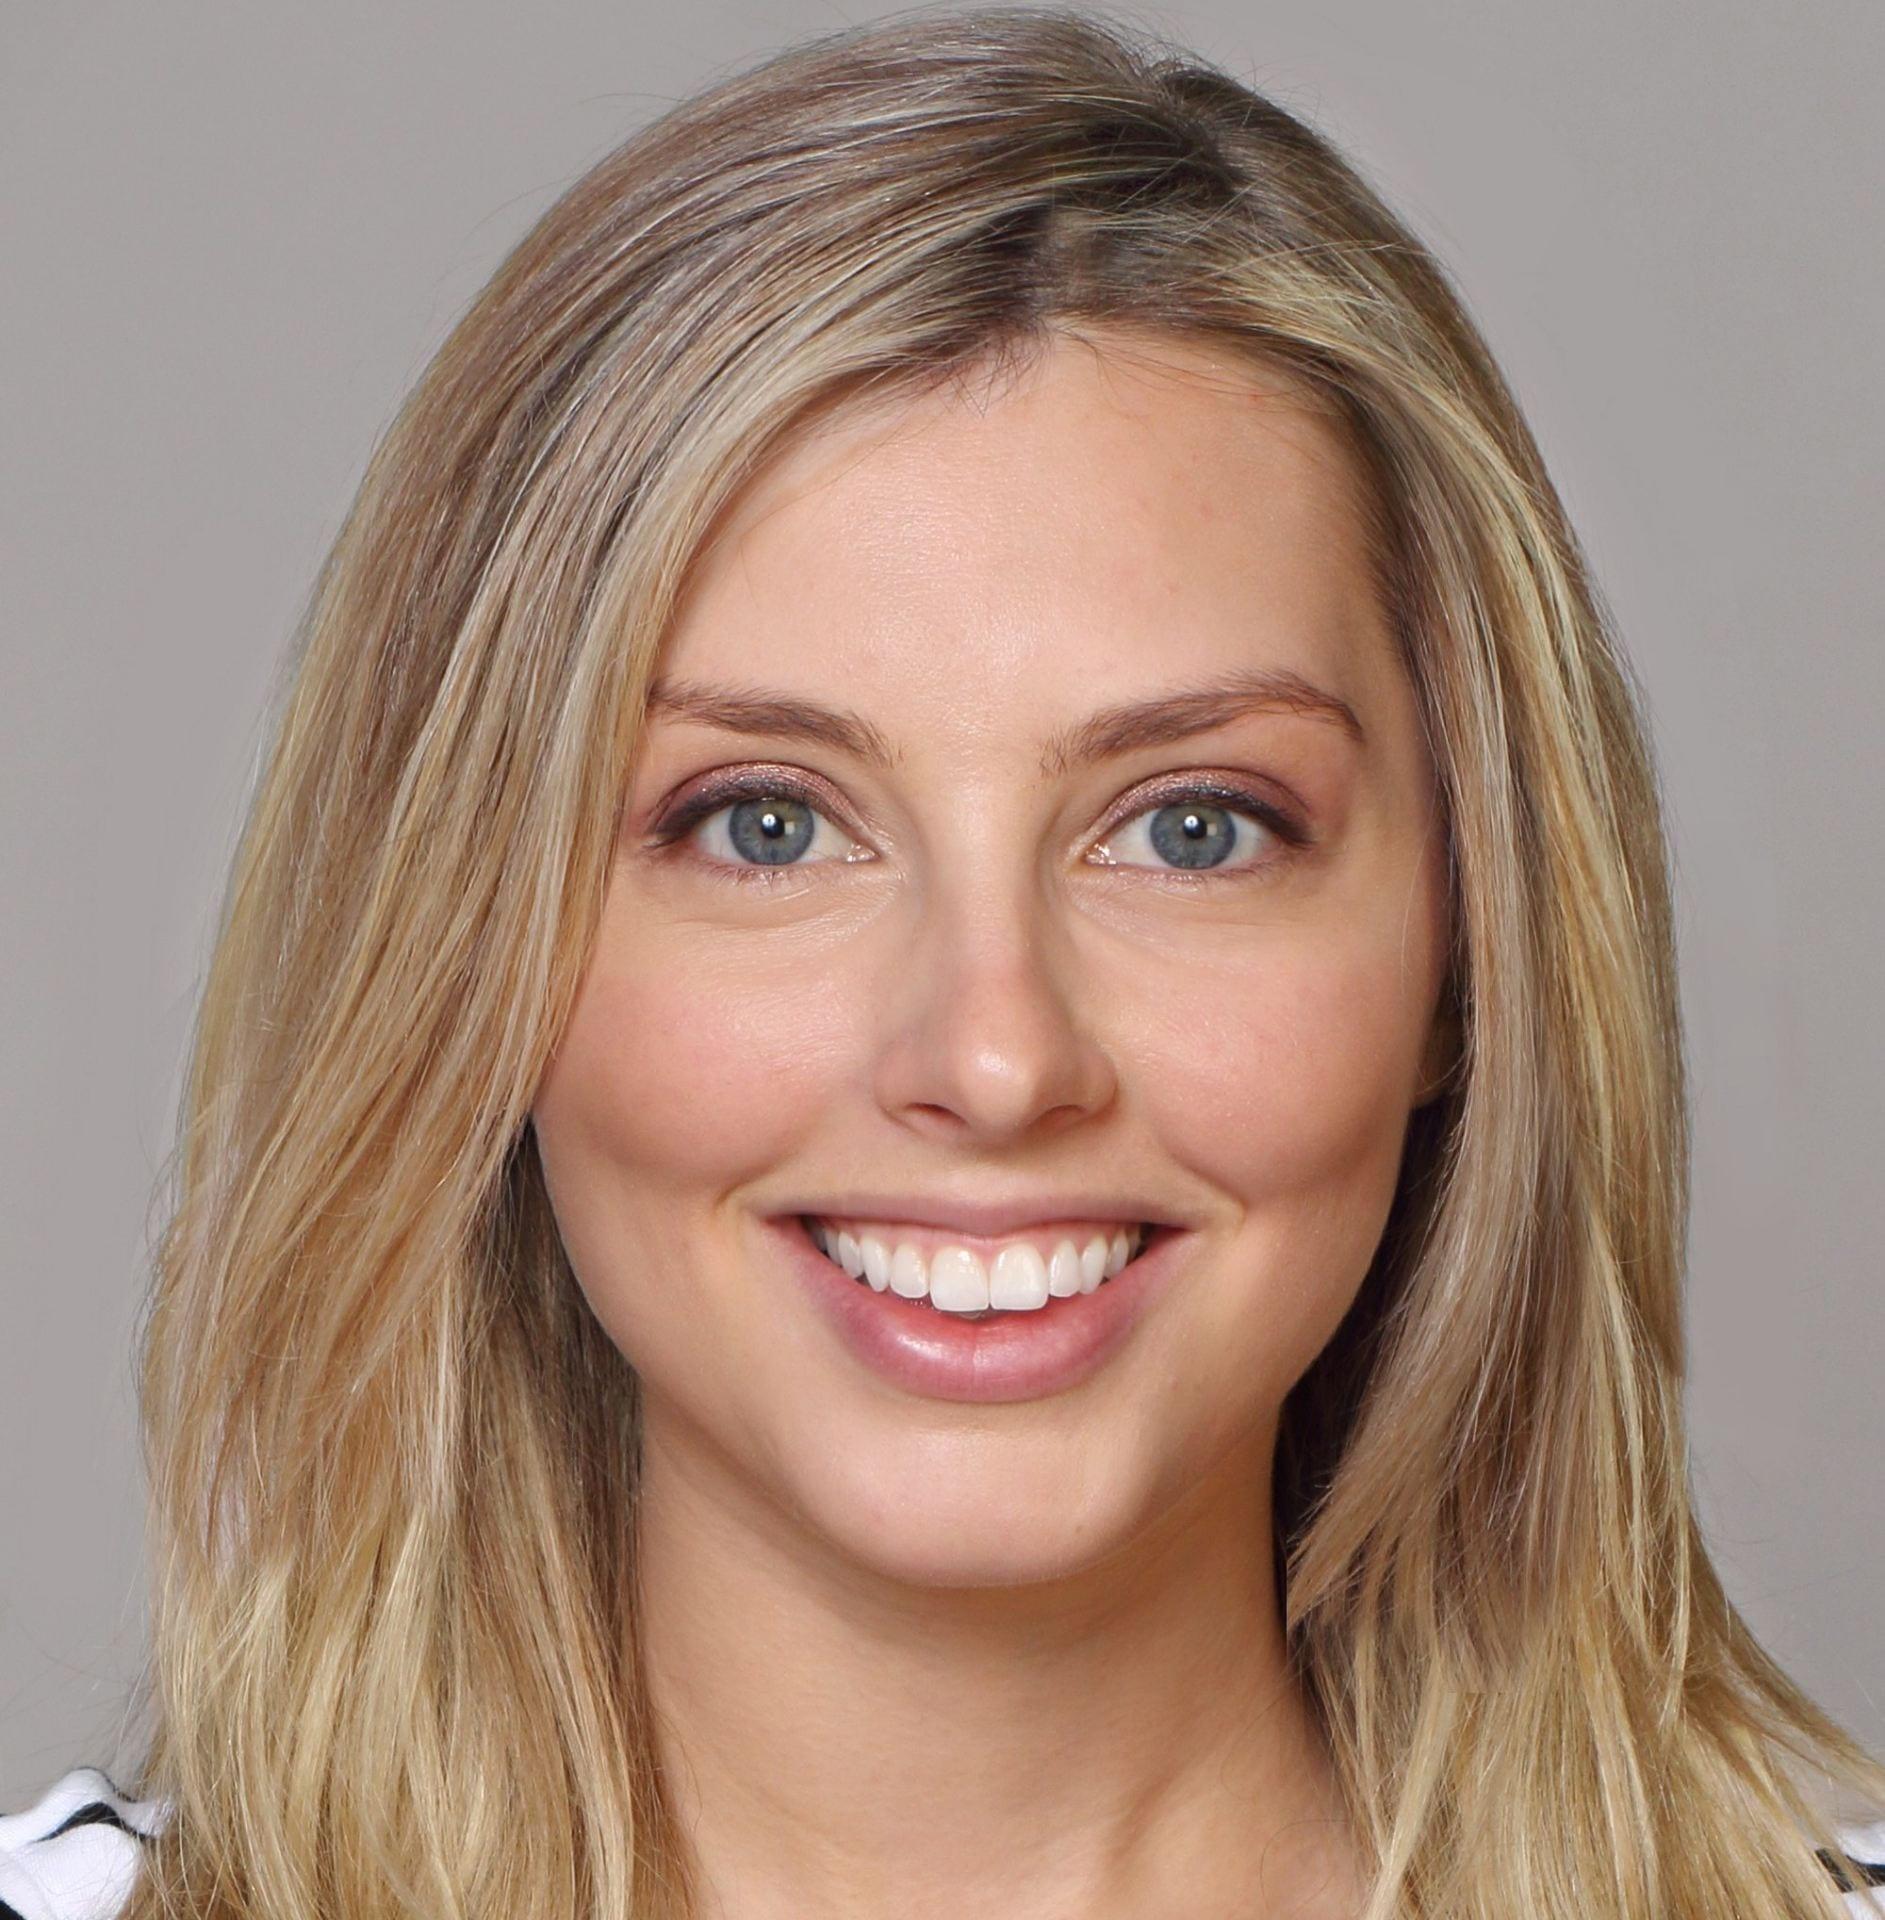 Brittany Kam